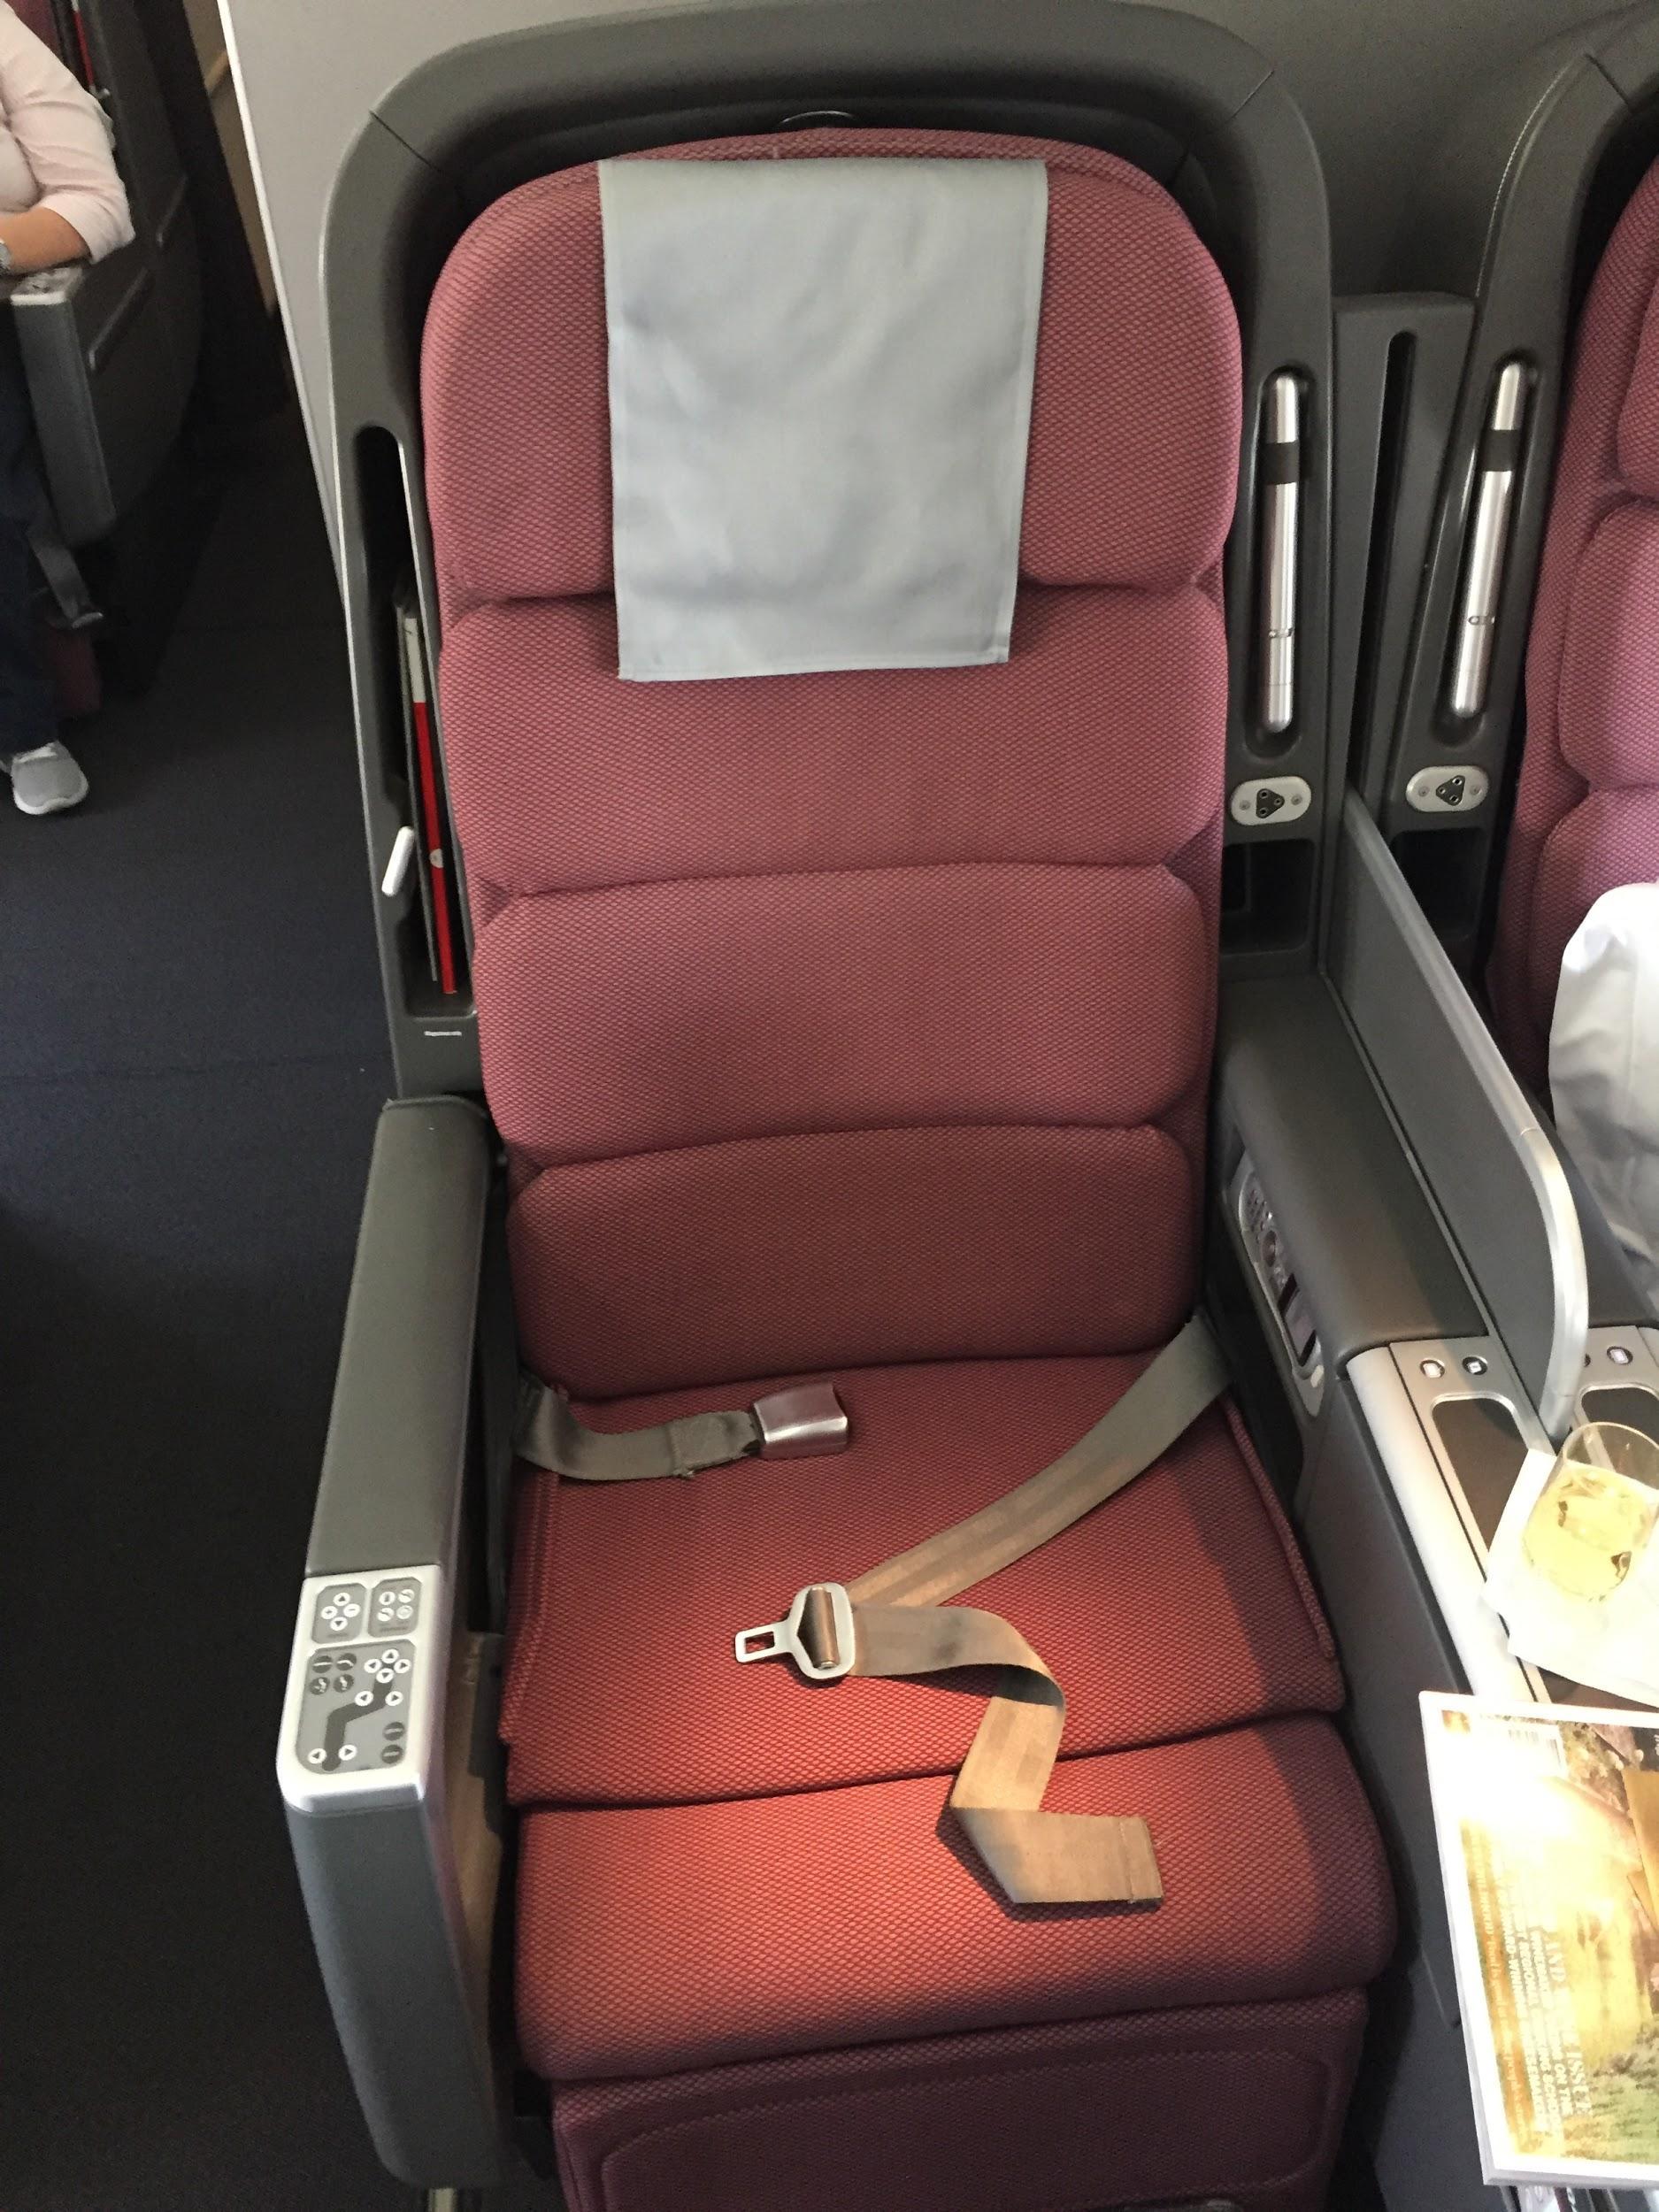 Qantas 474 Business Class